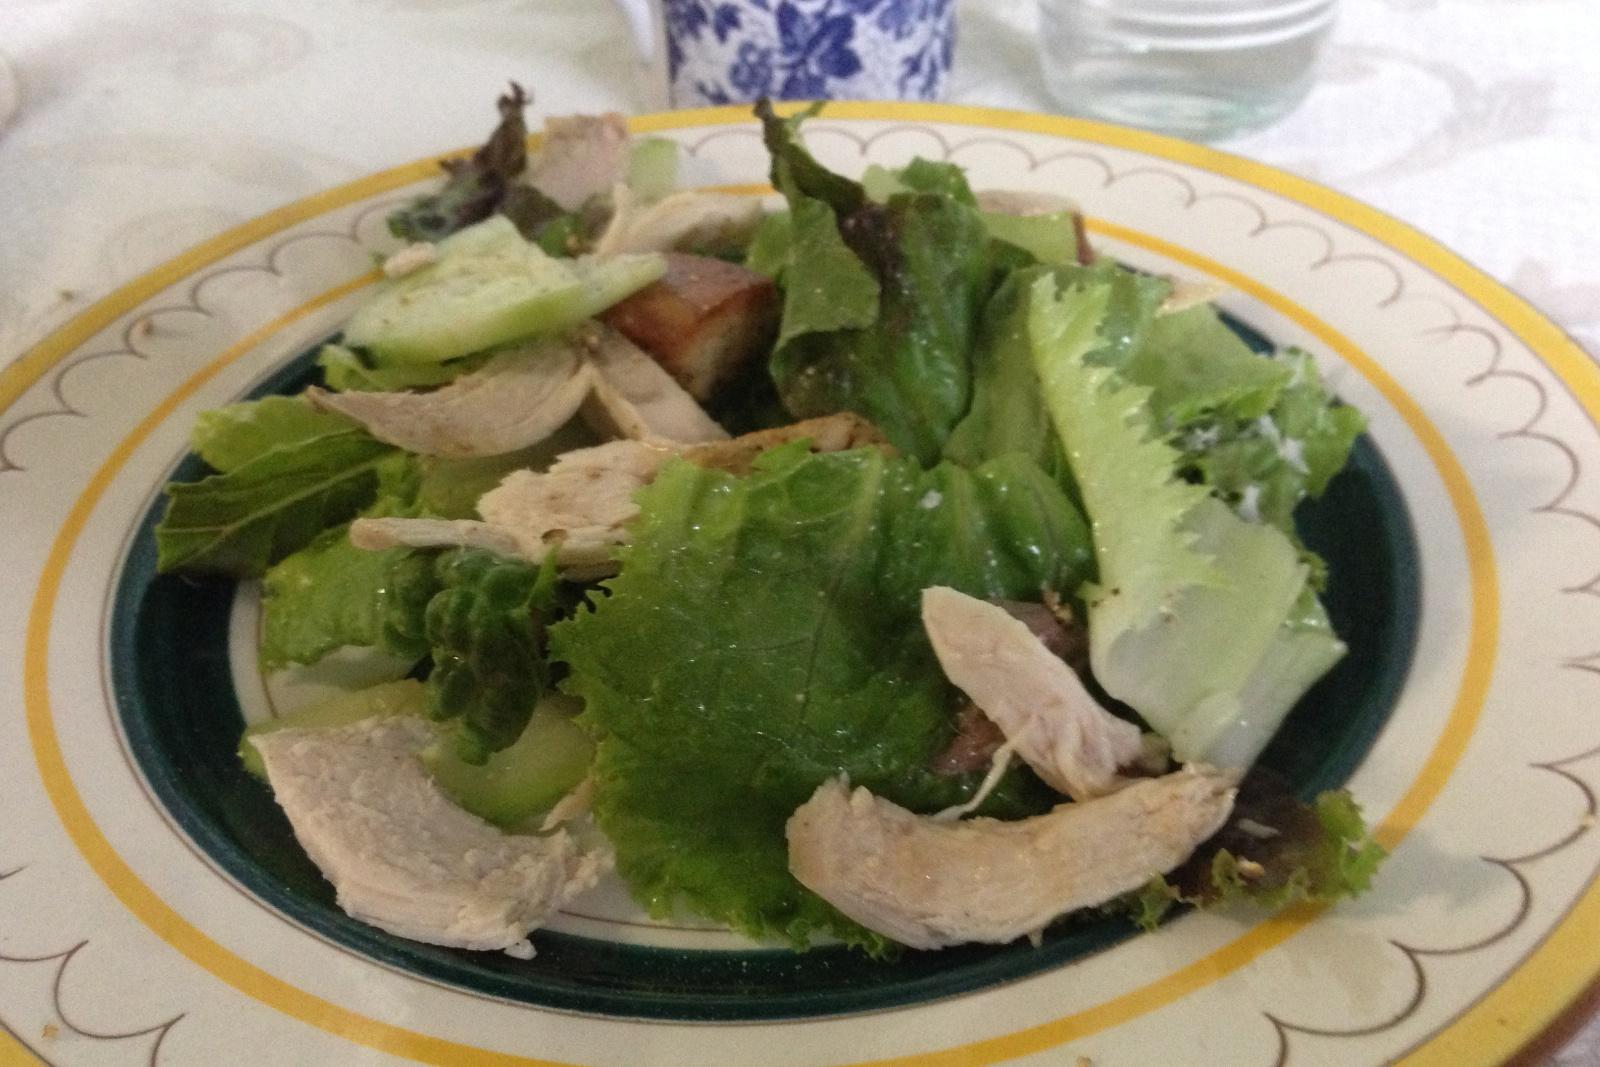 http://blog.rickk.com/food/2014/08/27/ate.2014.08.27.l.jpg